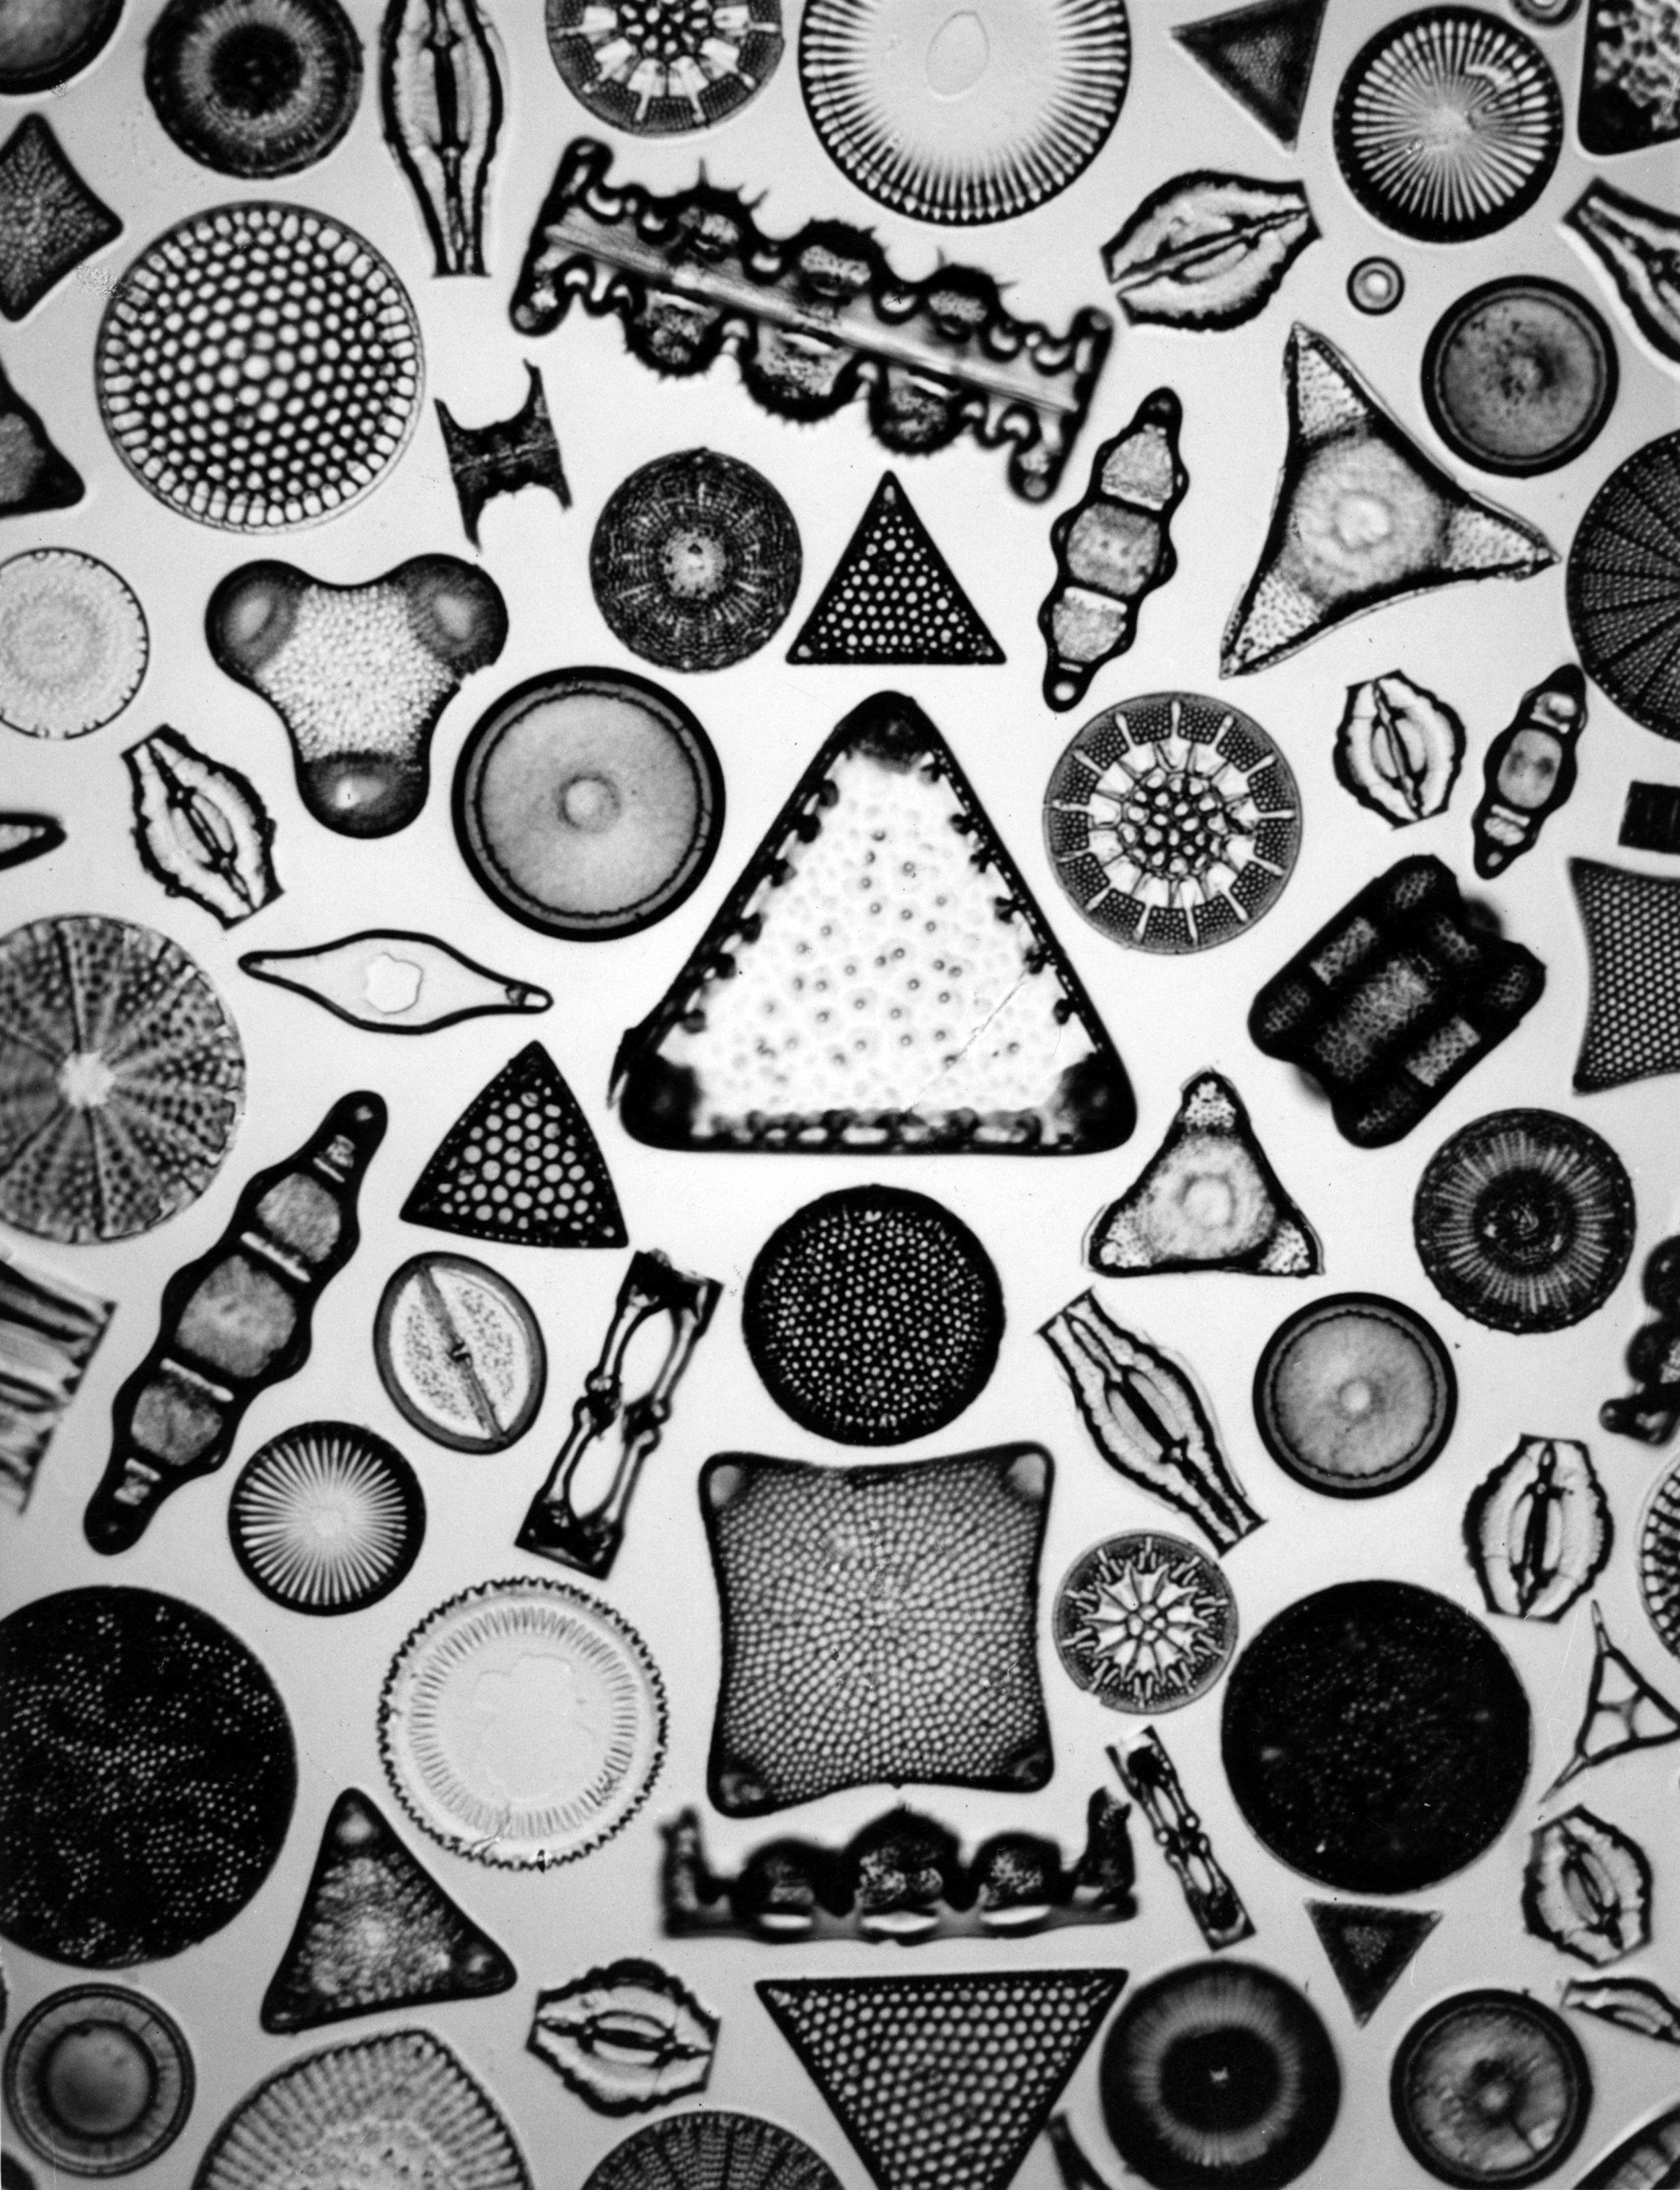 Carl Strüwe, Archetype of Individuality (1933). Courtesy Steven Kasher Gallery, New York 1 /2